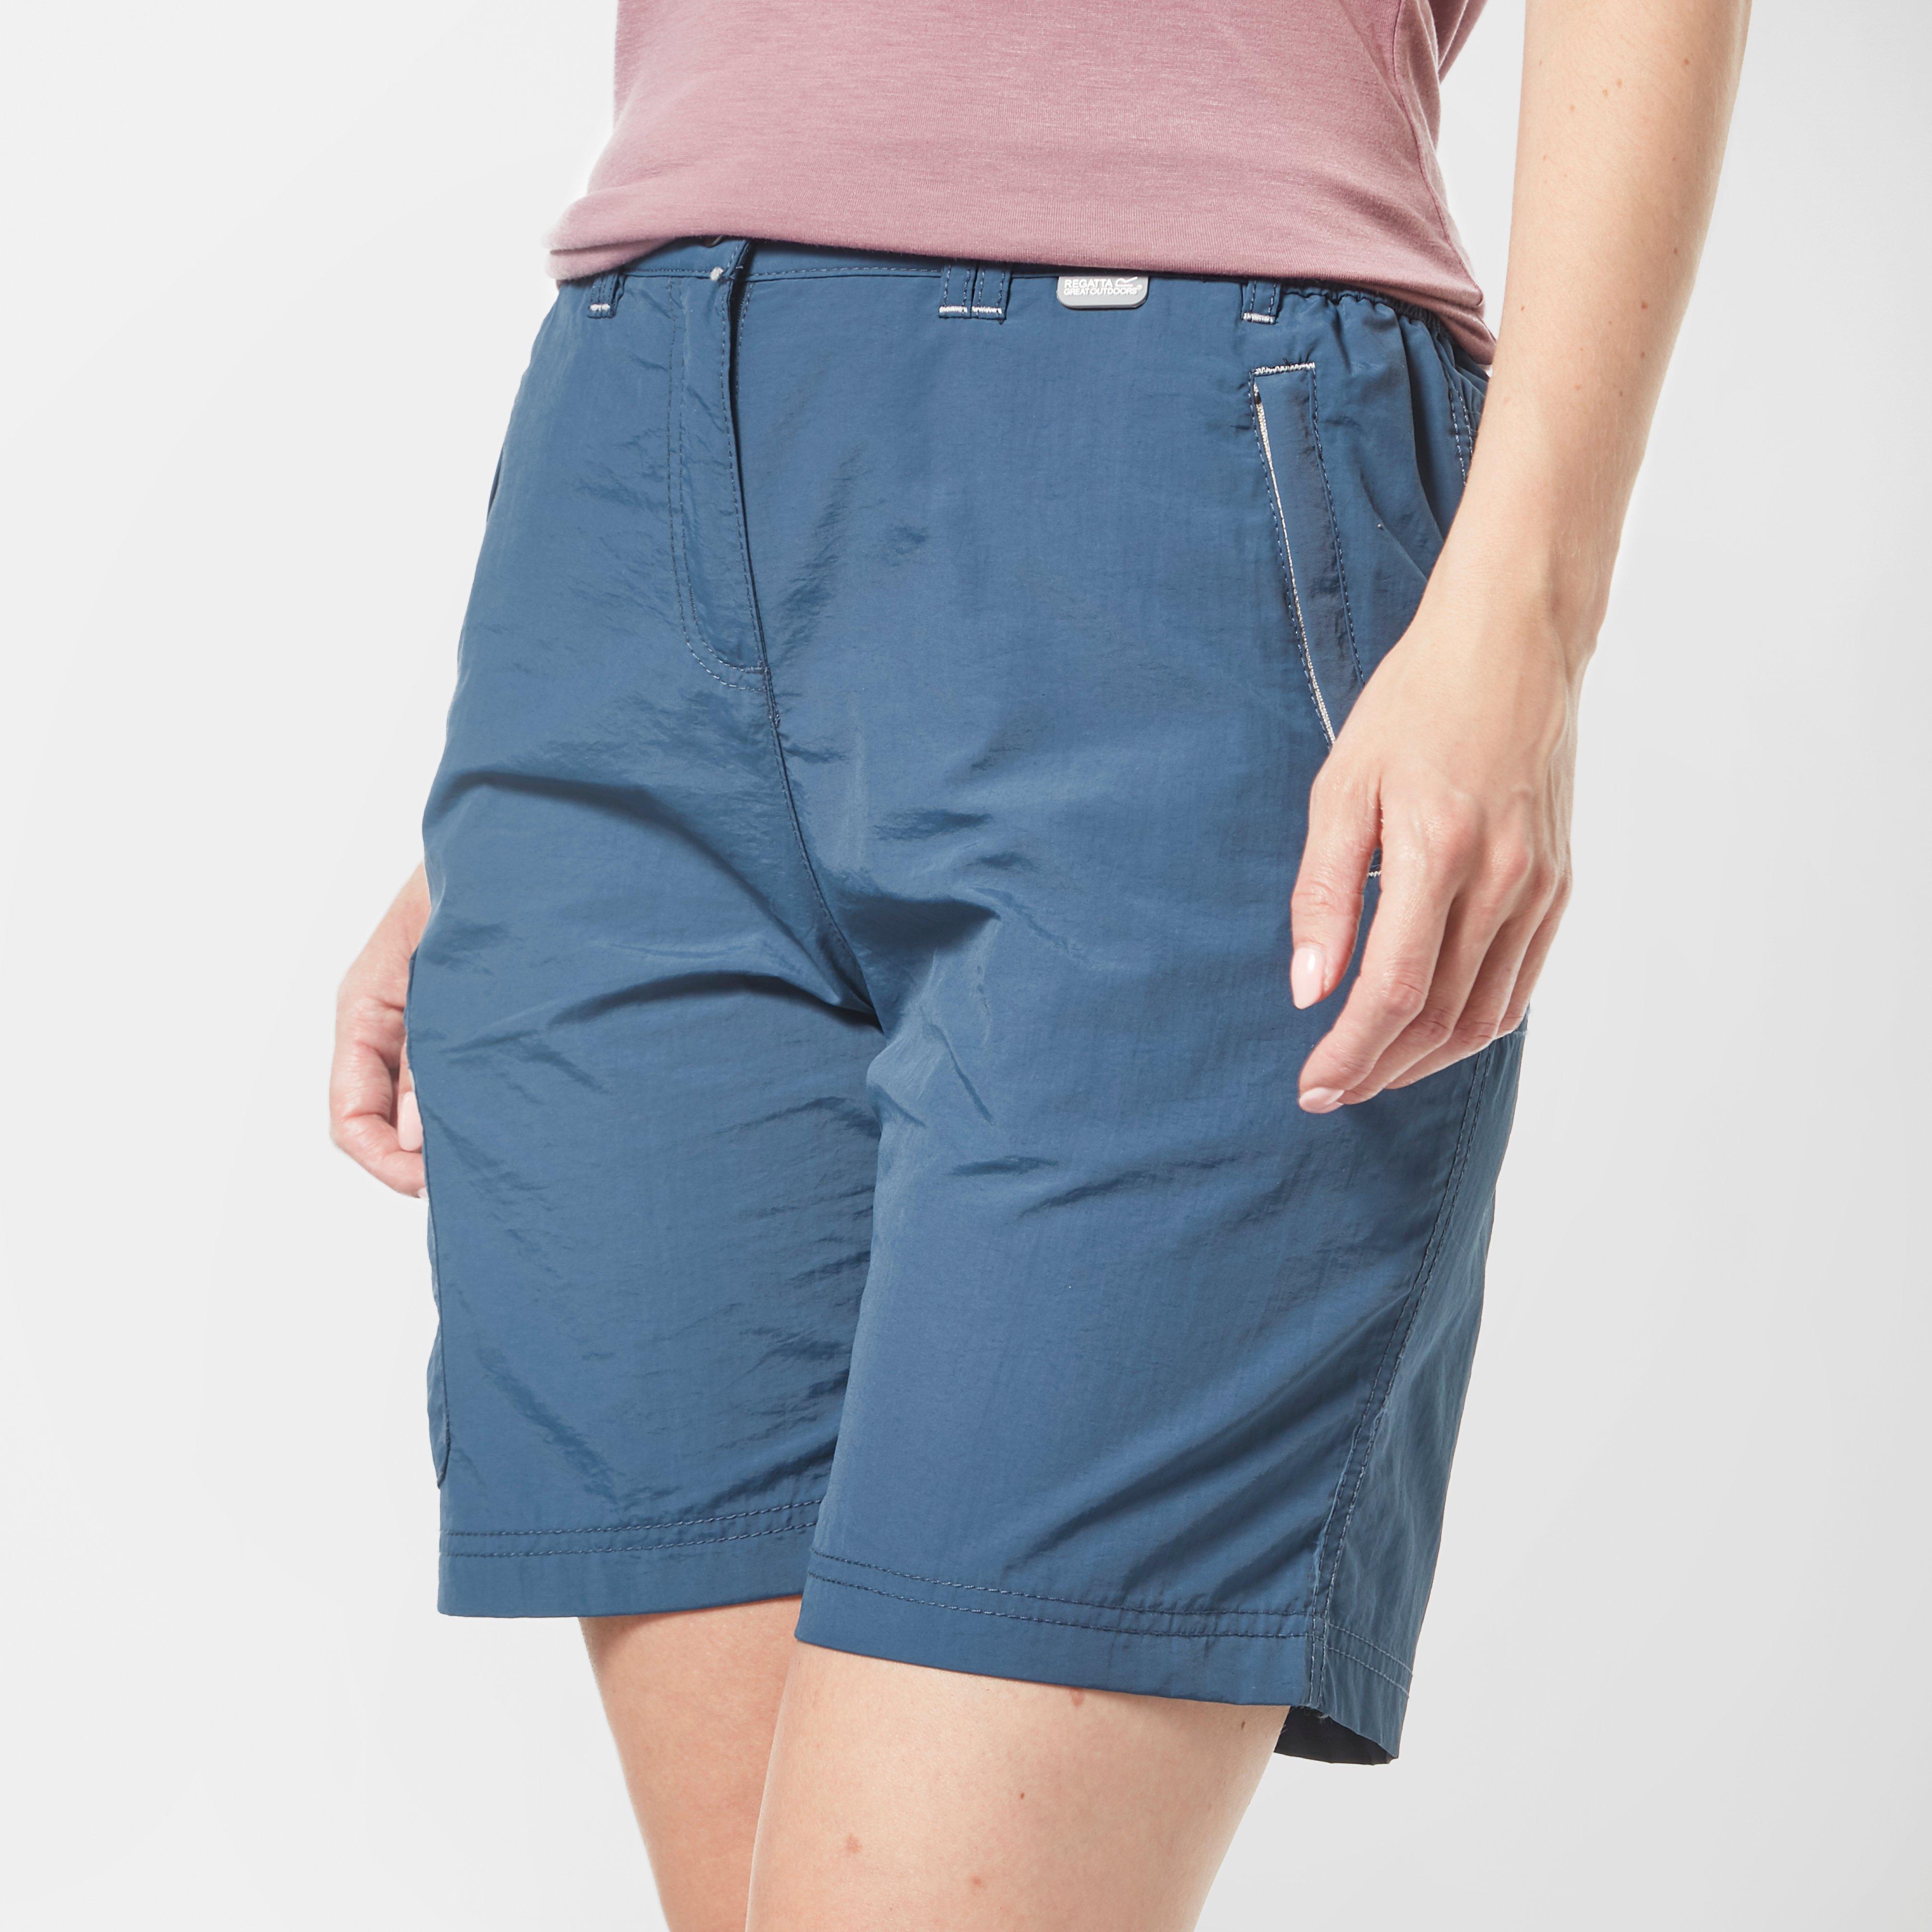 Regatta Regatta Womens Chaska Shorts - Blue, Blue